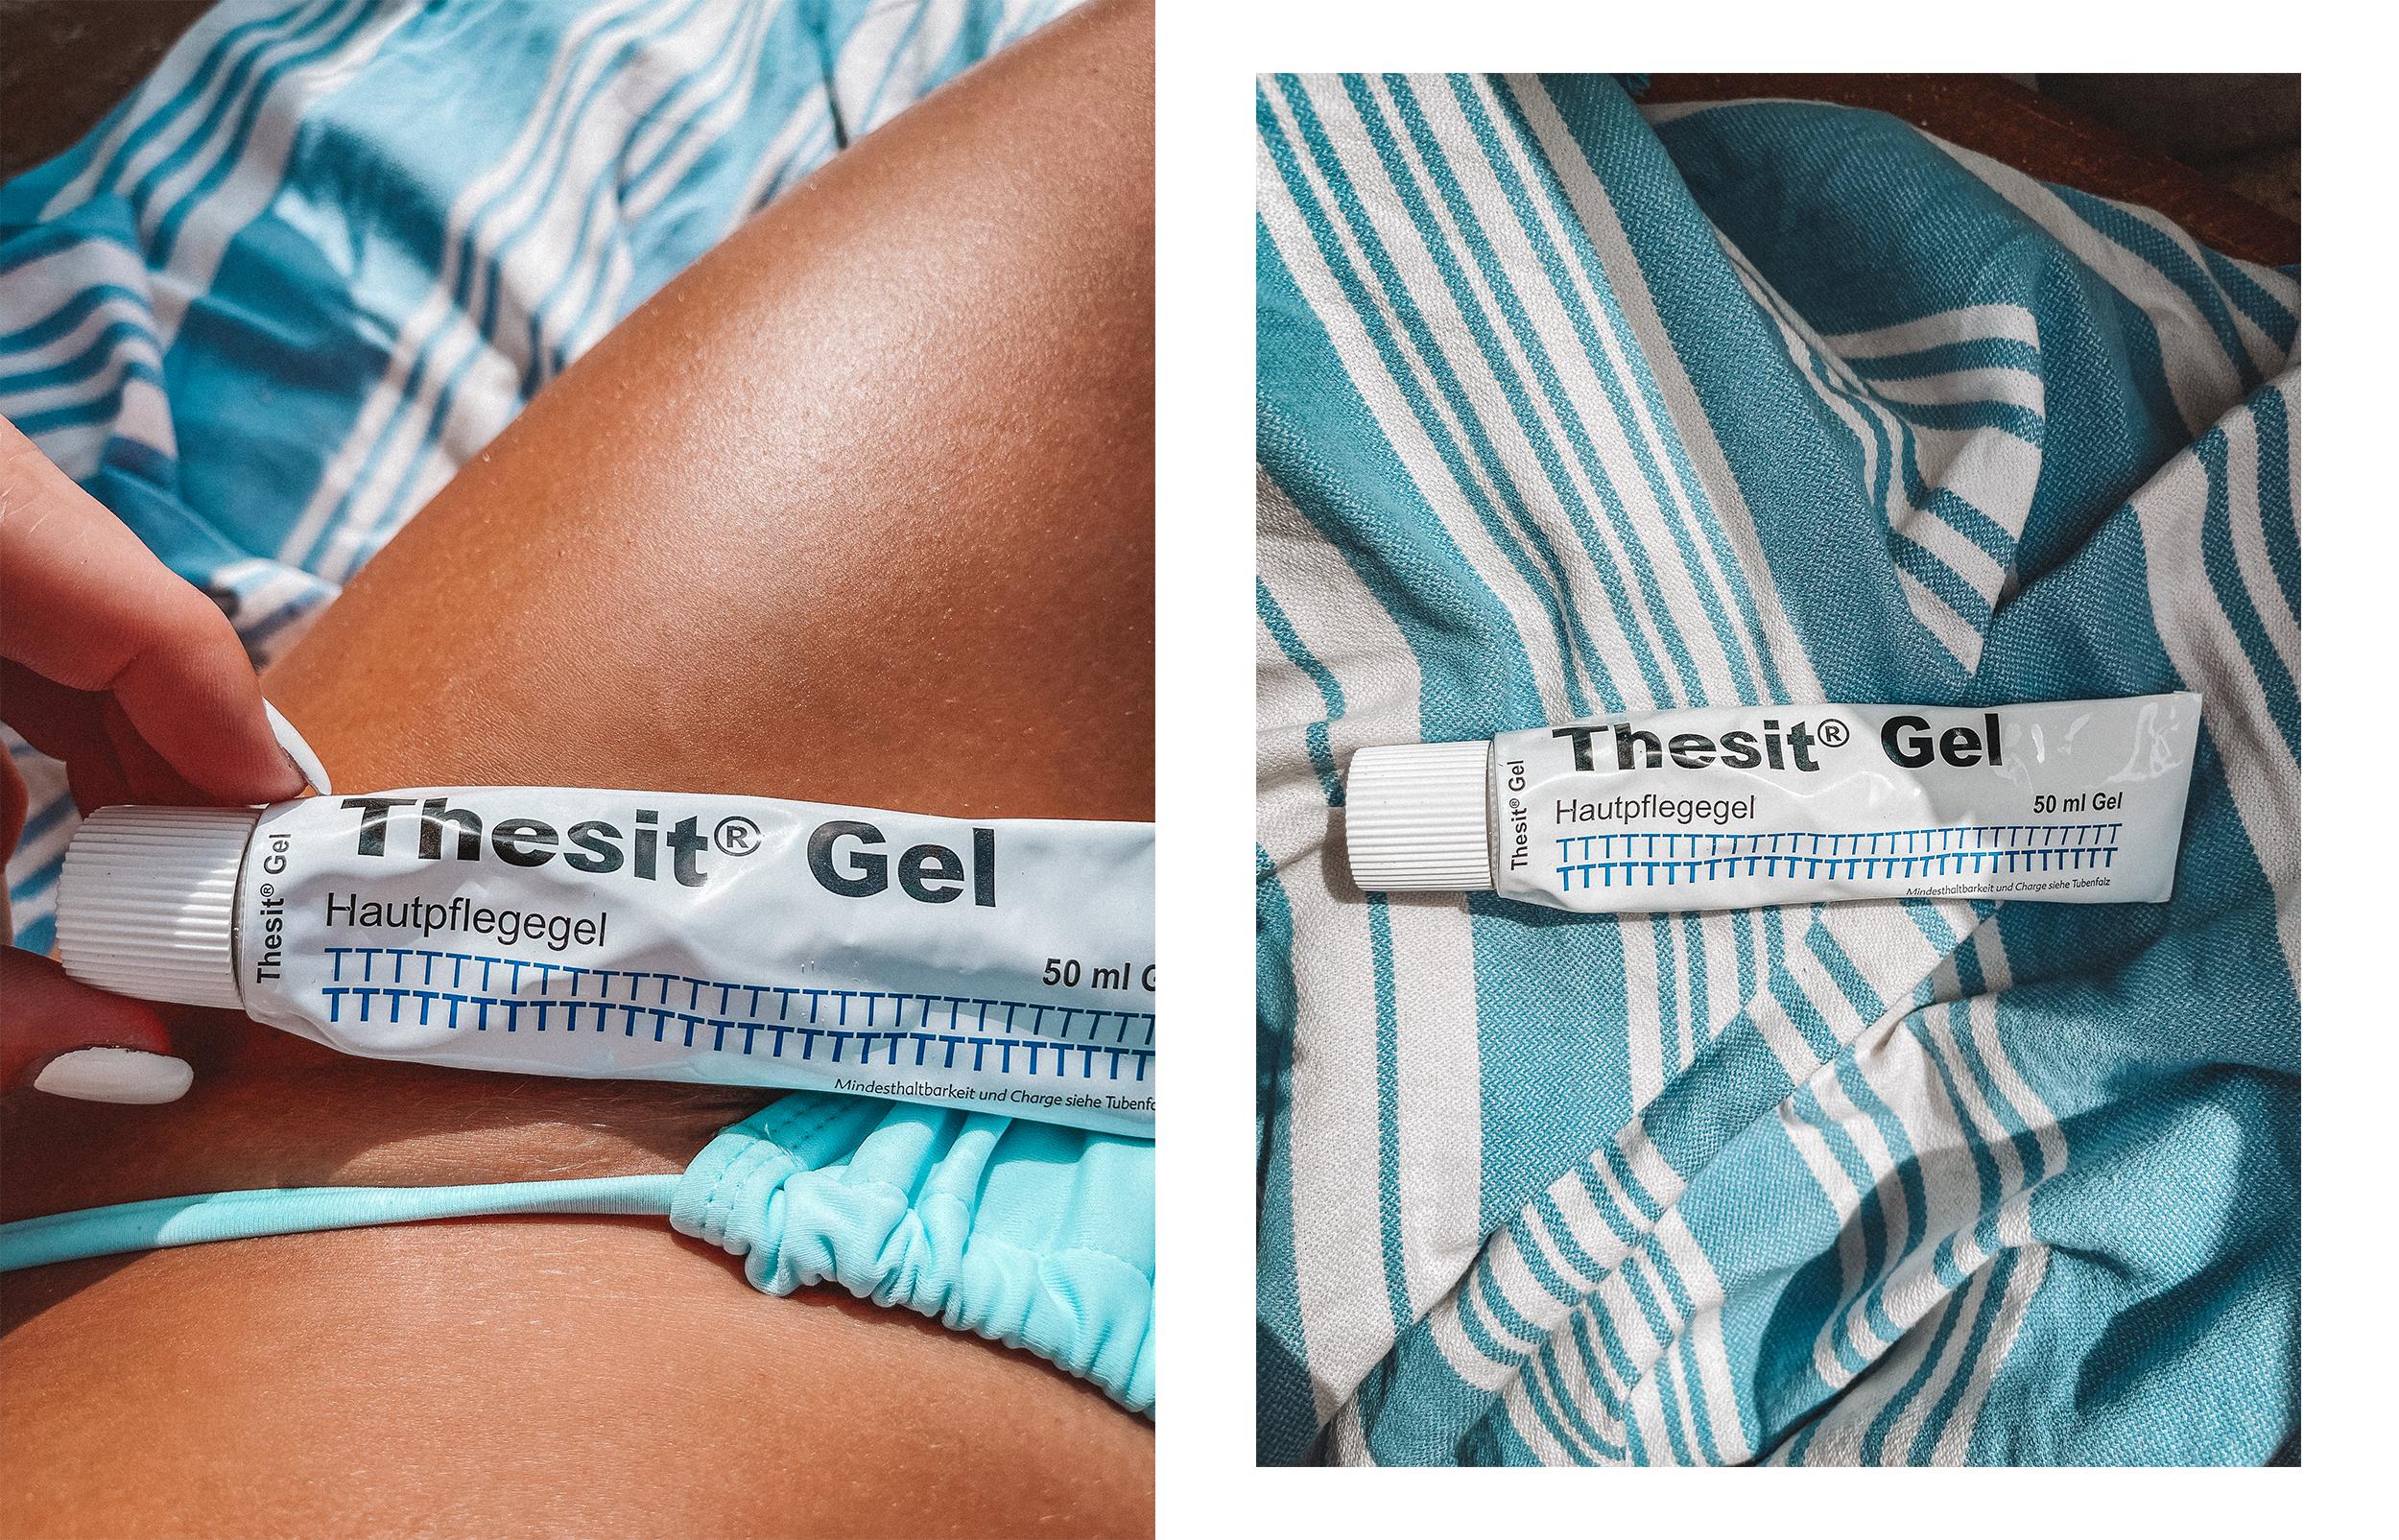 Lauralamode Thesit Hautgel Mückenstich Sonnenbrand T Skincare Summer Beauty Product Sonnebrand Hilfe Mückenstiche Lindern5